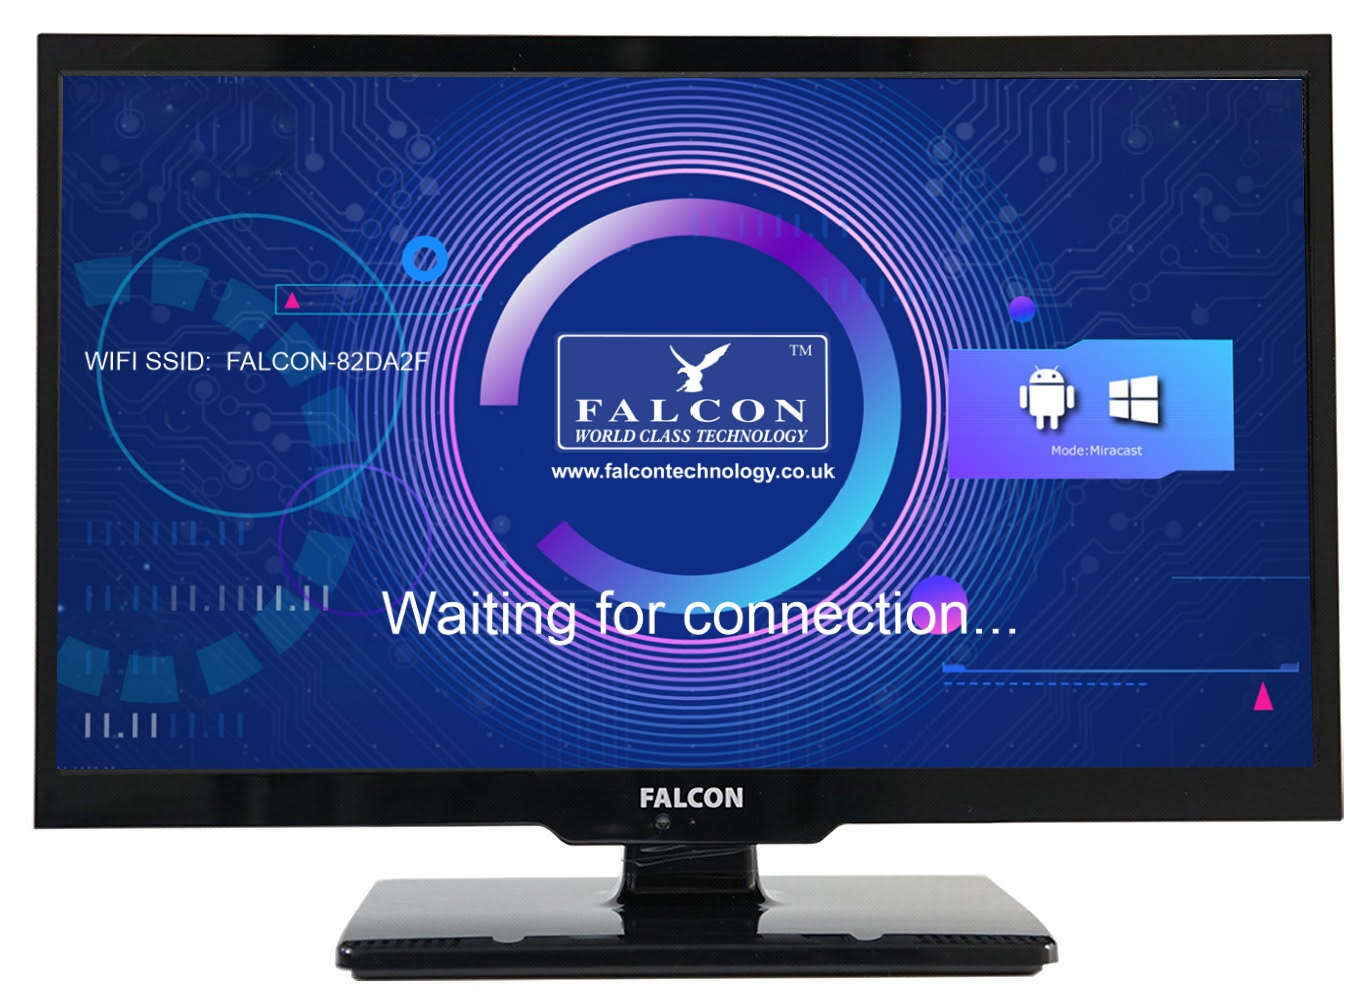 On_Falcon_TV_Full